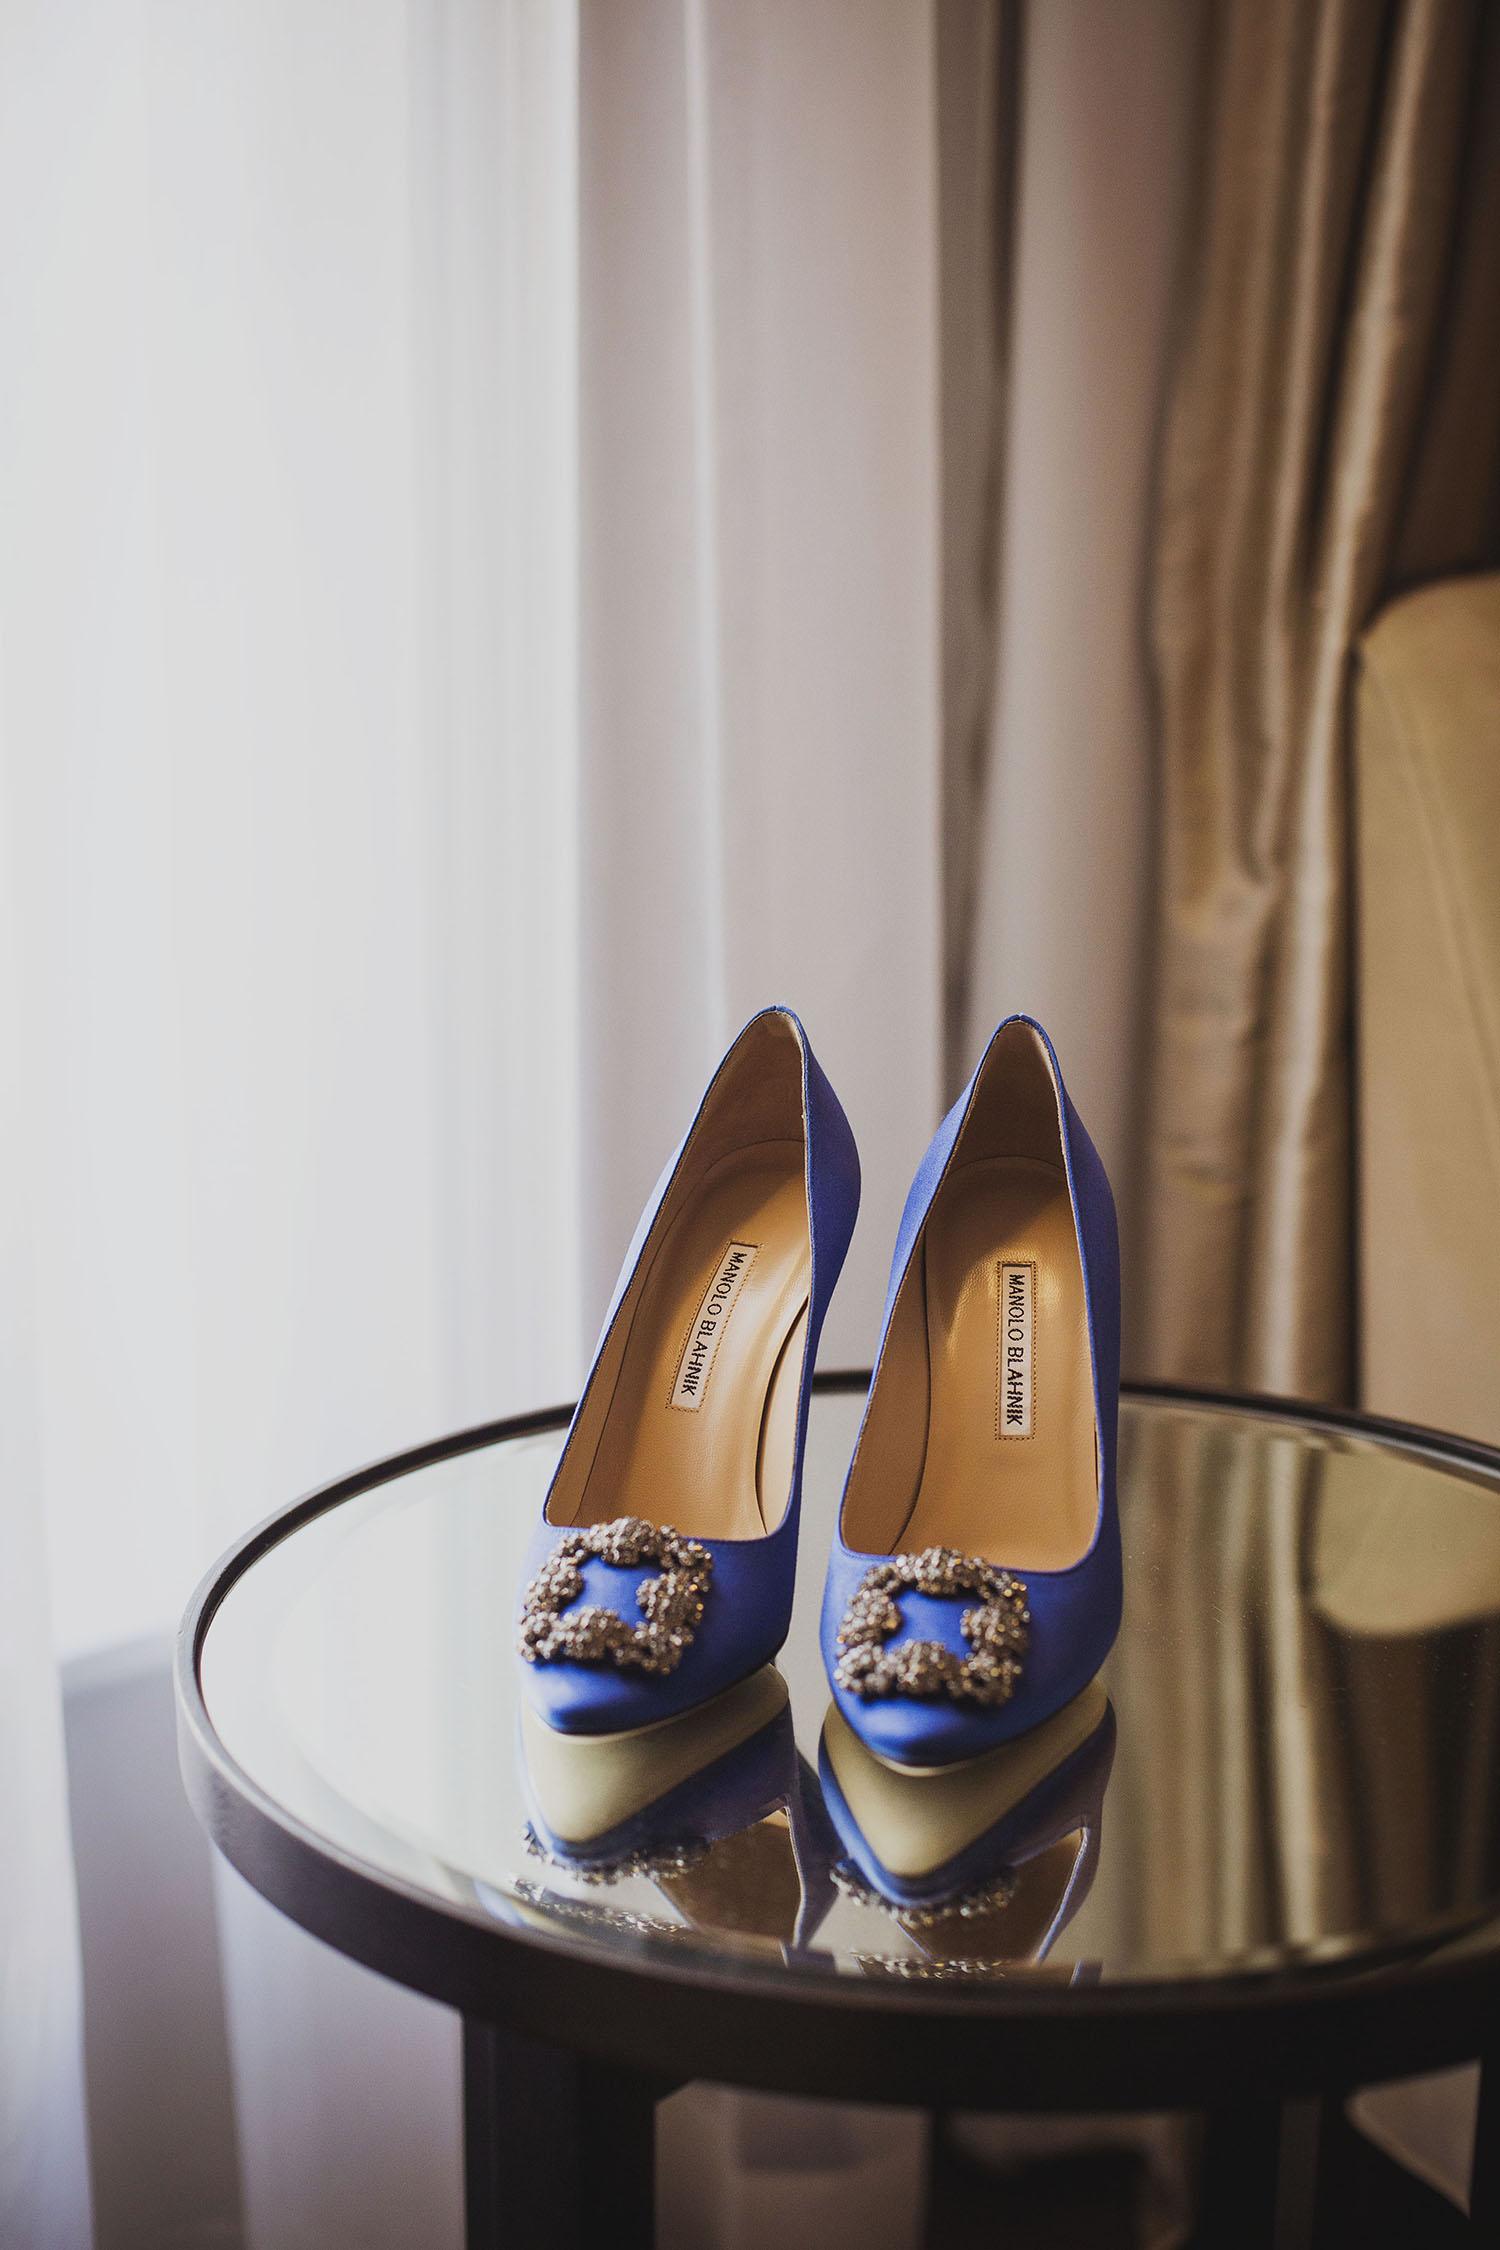 manolo blahnik shoes bridal prep corinthia hotel london wedding photographer